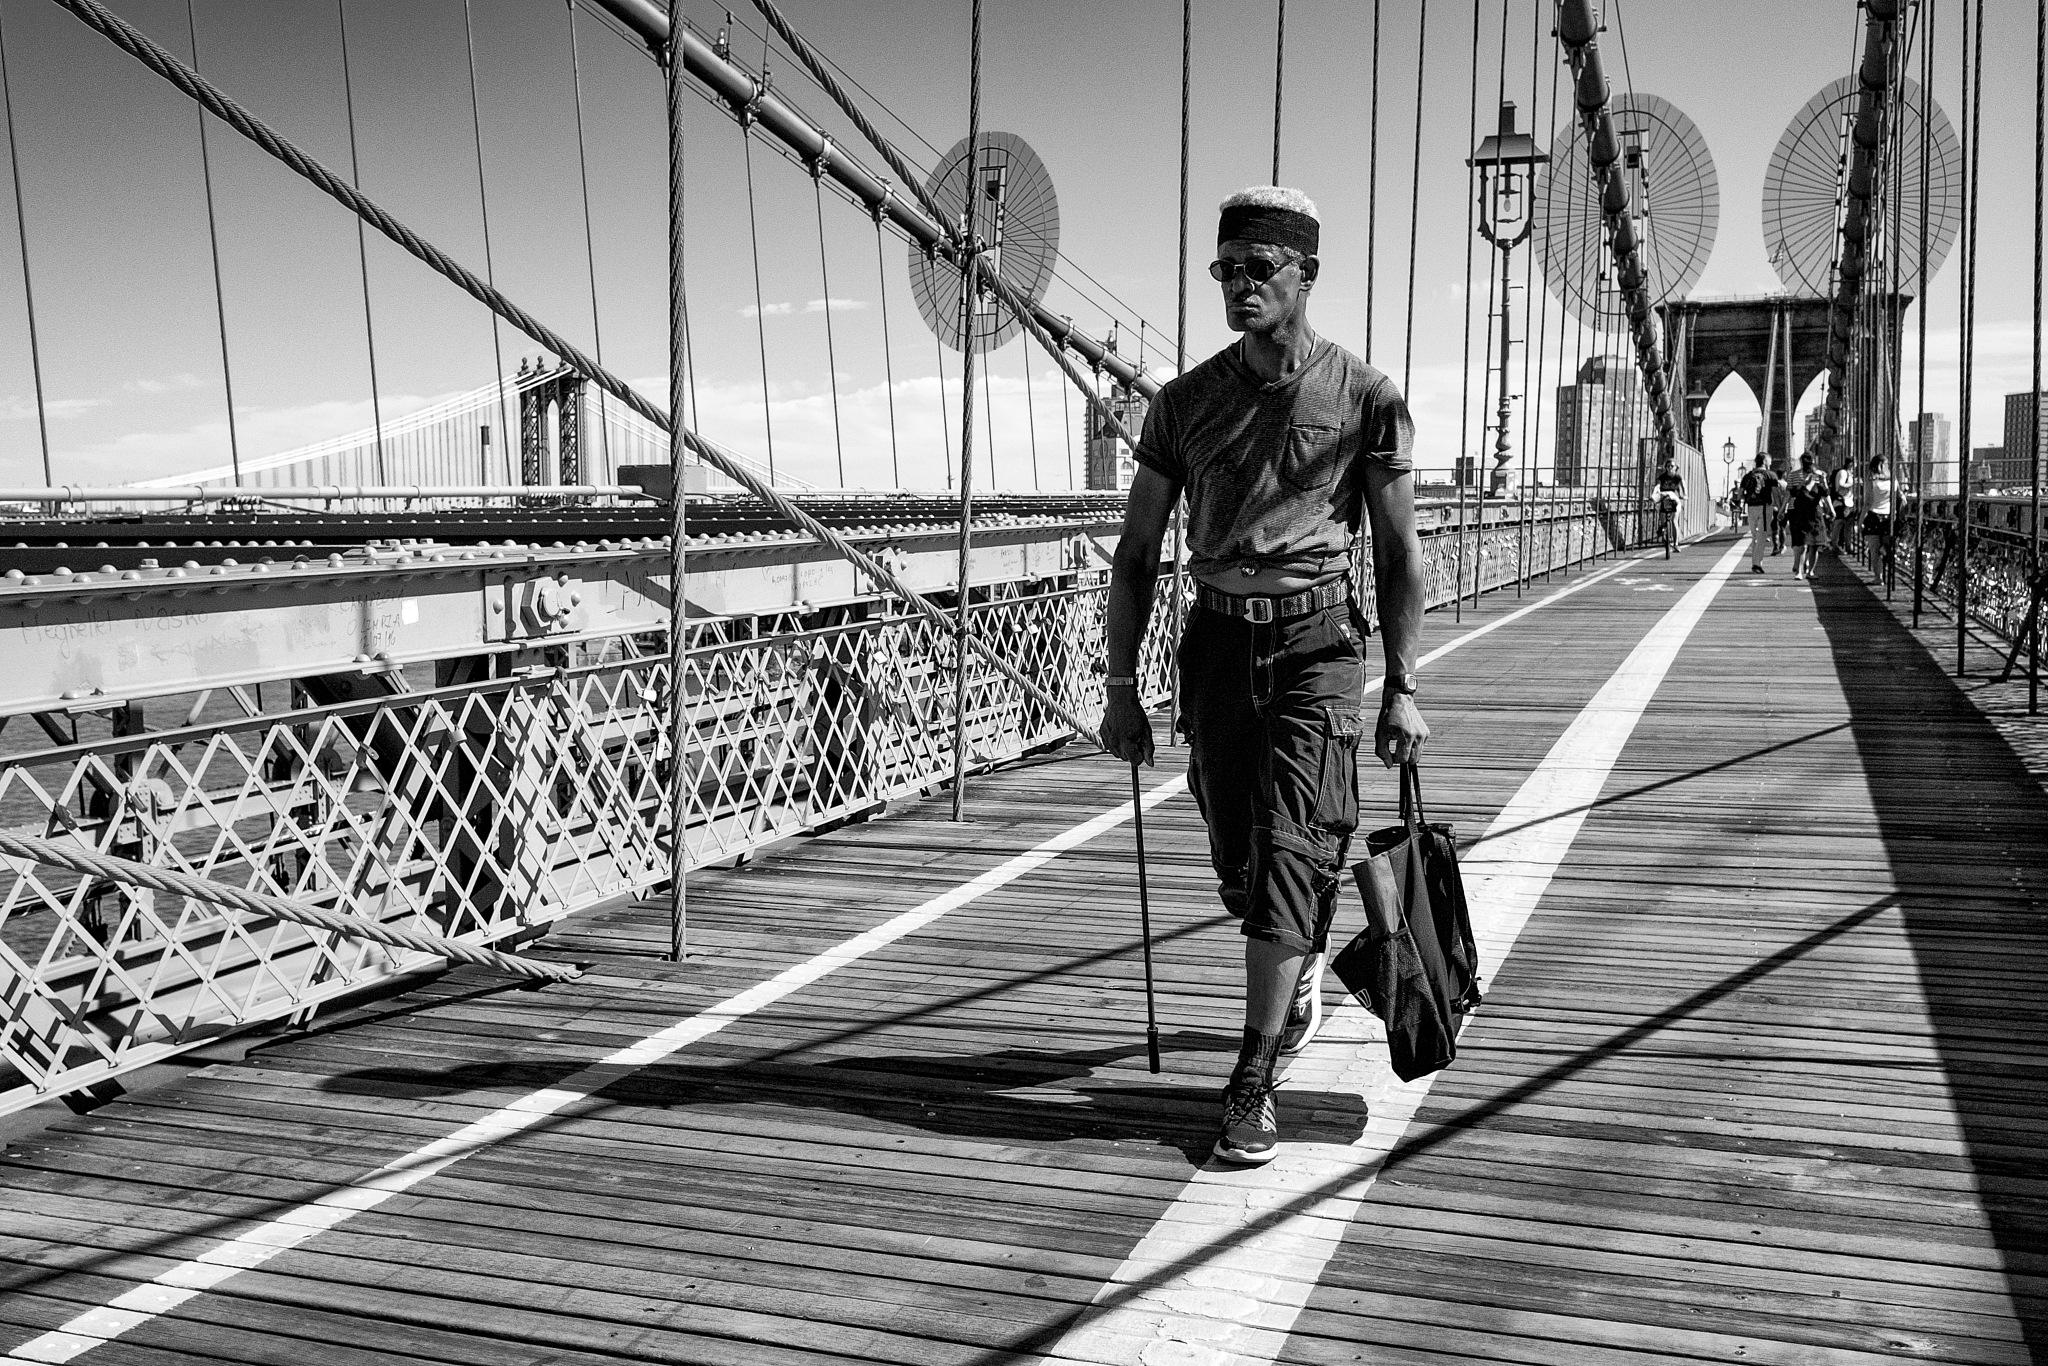 Walk the Line by Jason Devaun